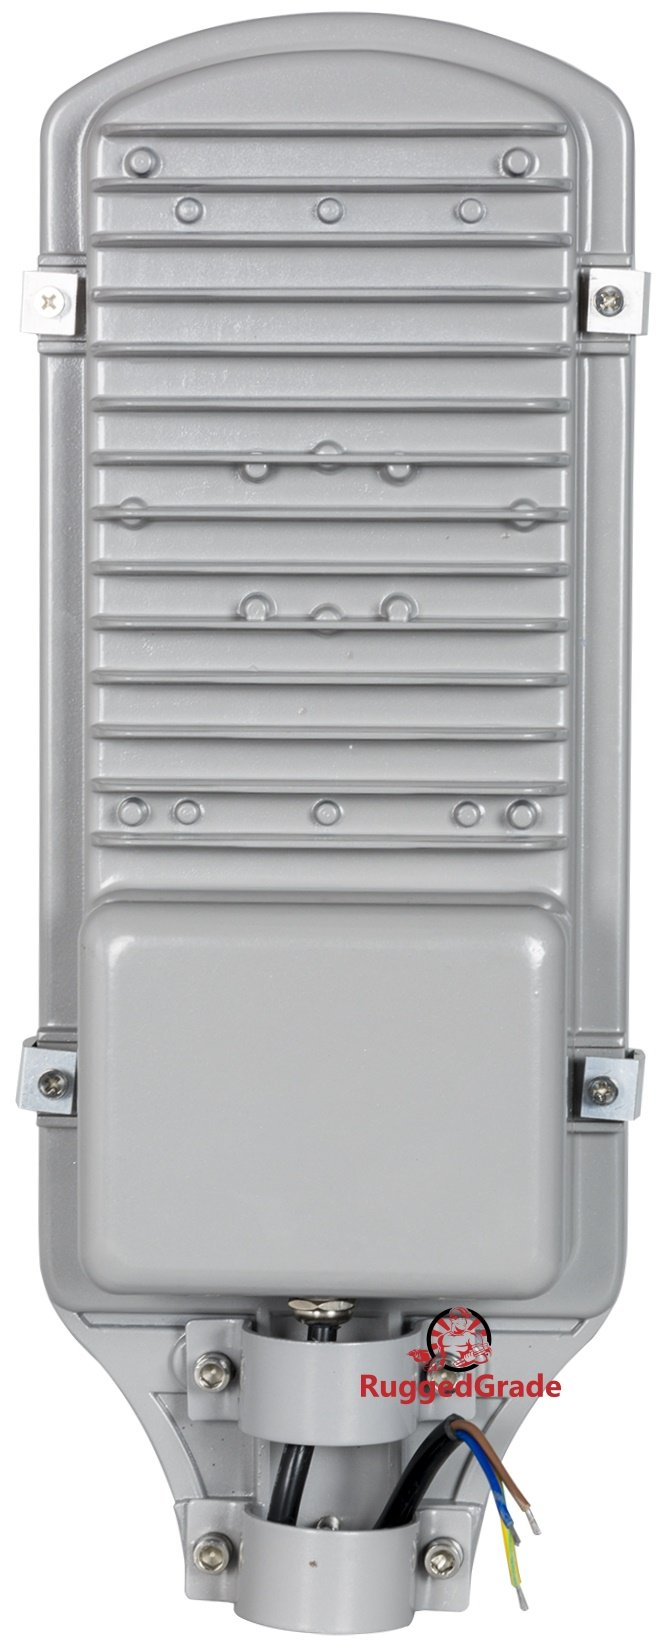 2,400 Lumen LED Area Light - 24Watts – 5000K Bright White - LED Pole Light - Heavy Duty Die Cast Aluminum - Parking lot Light - Pole Light- Outdoor LED Street Light or LED Area Light